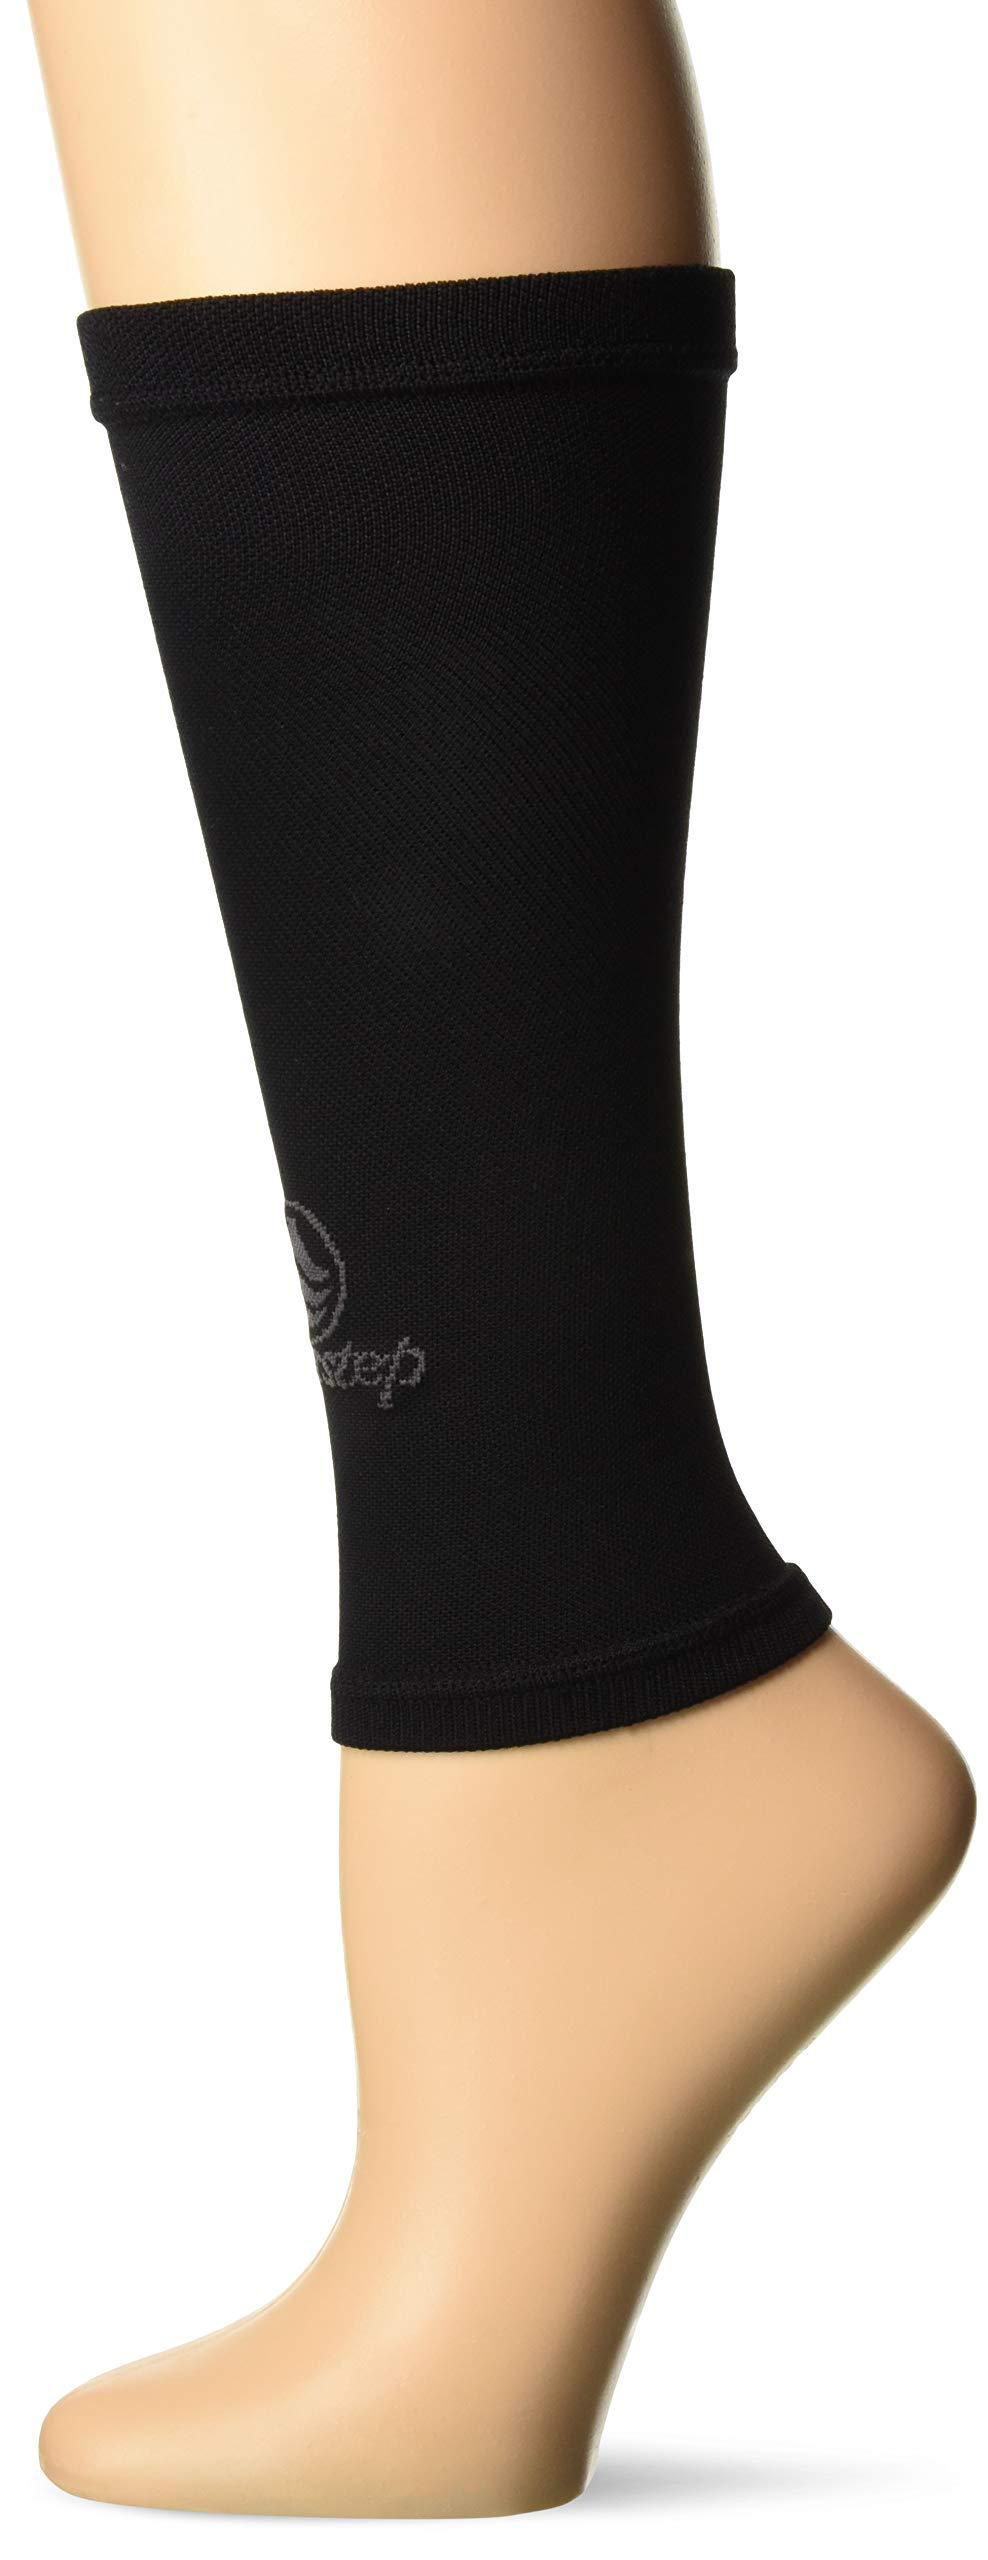 Powerstep Performance Calf Sleeves, Women, black X-Large Regular US